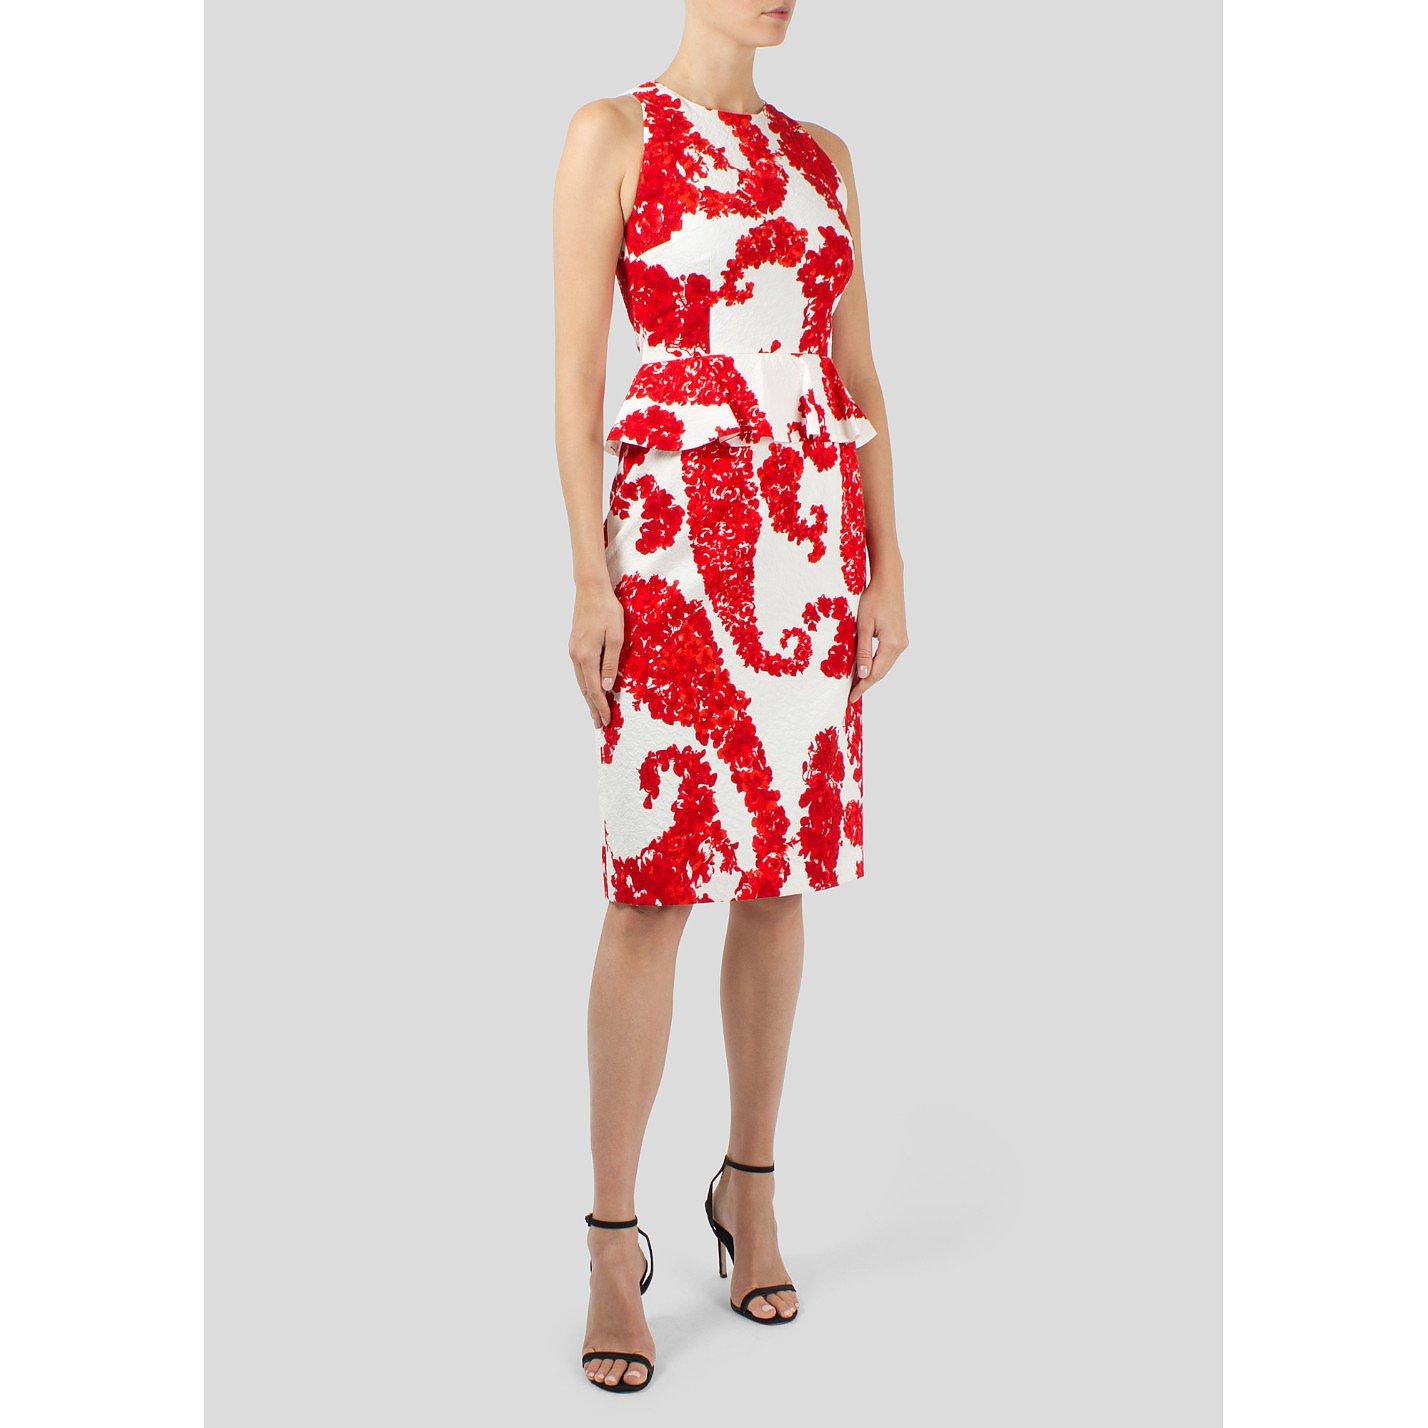 Giambattista Valli Floral Print Dress